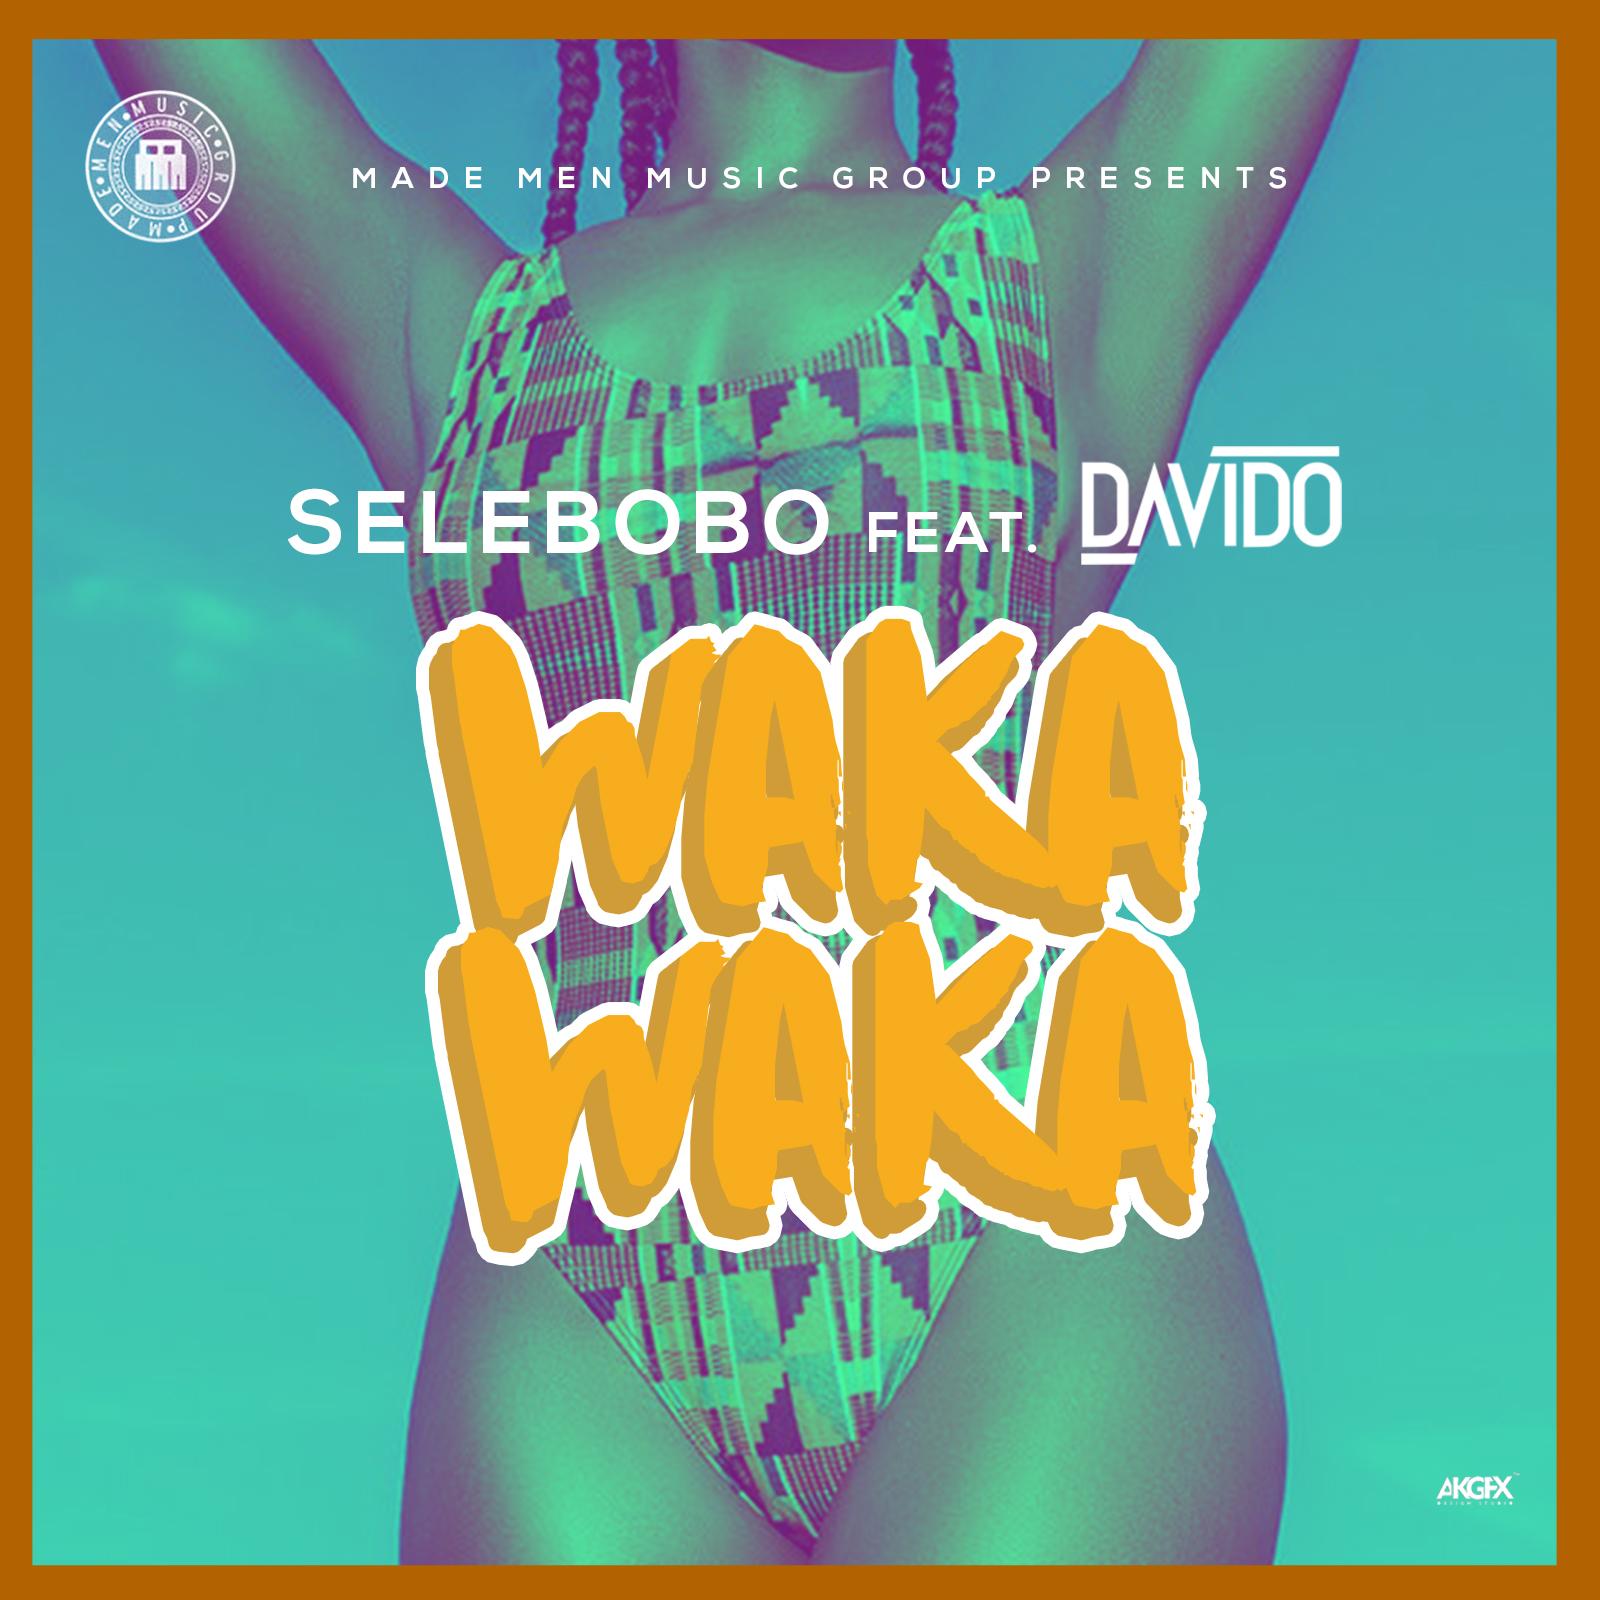 [Music] Selebobo Ft. Davido – Waka Waka